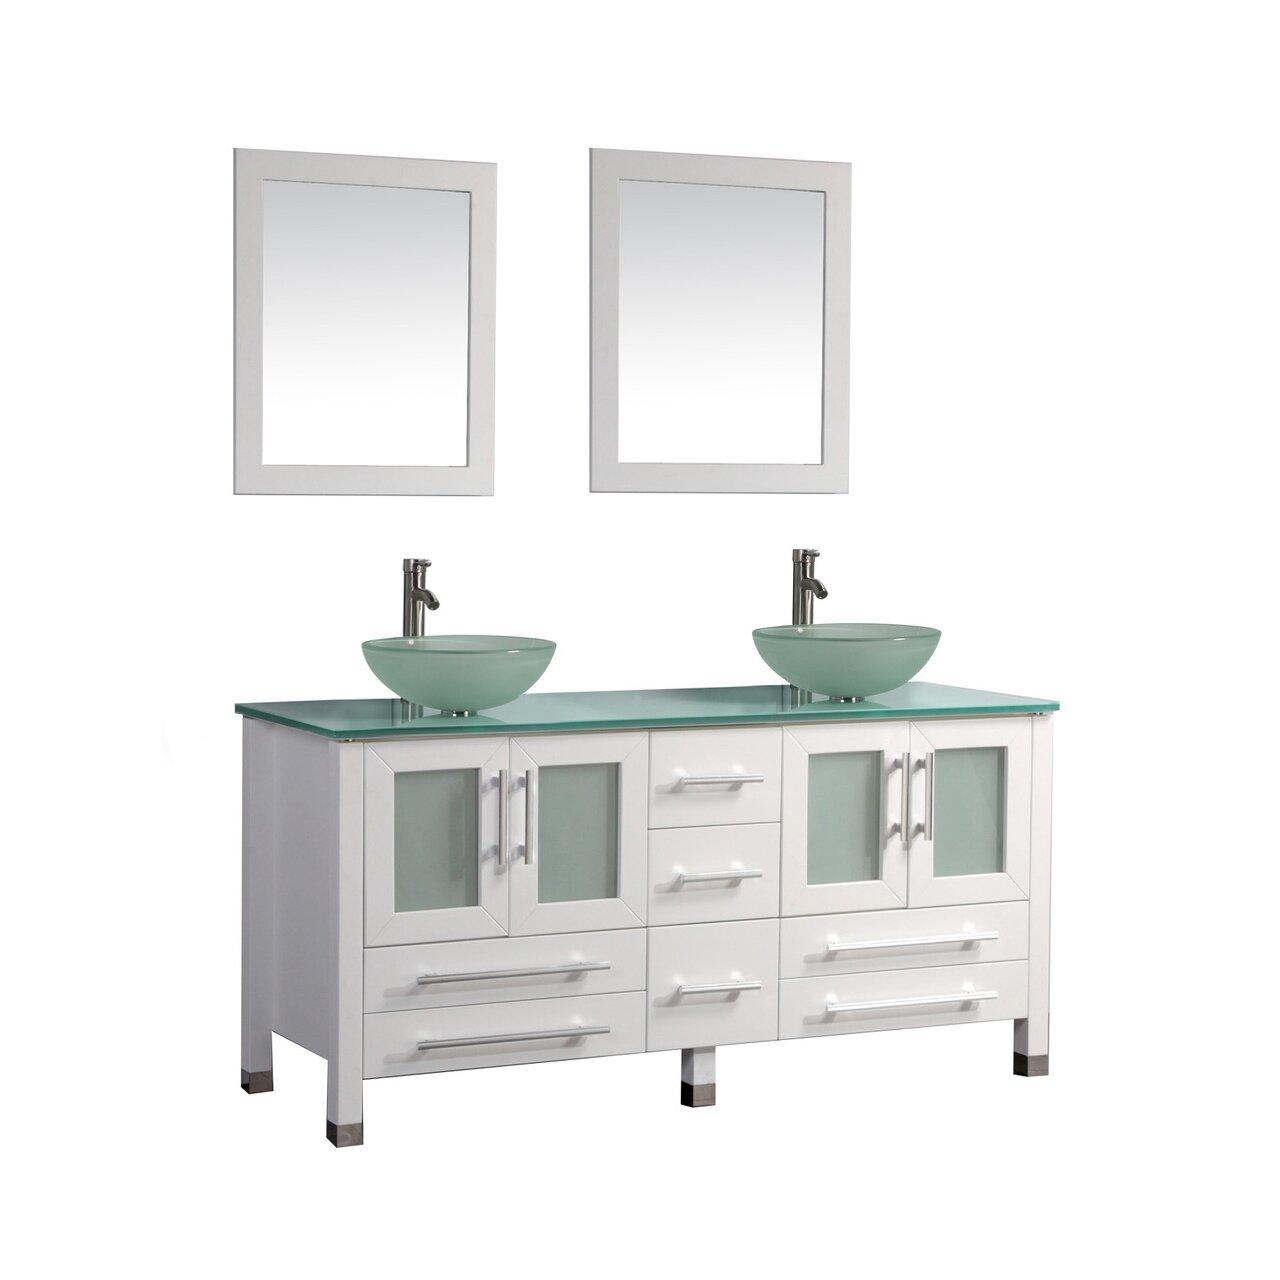 Mtdvanities Cuba 71 Double Sink Bathroom Vanity Set With